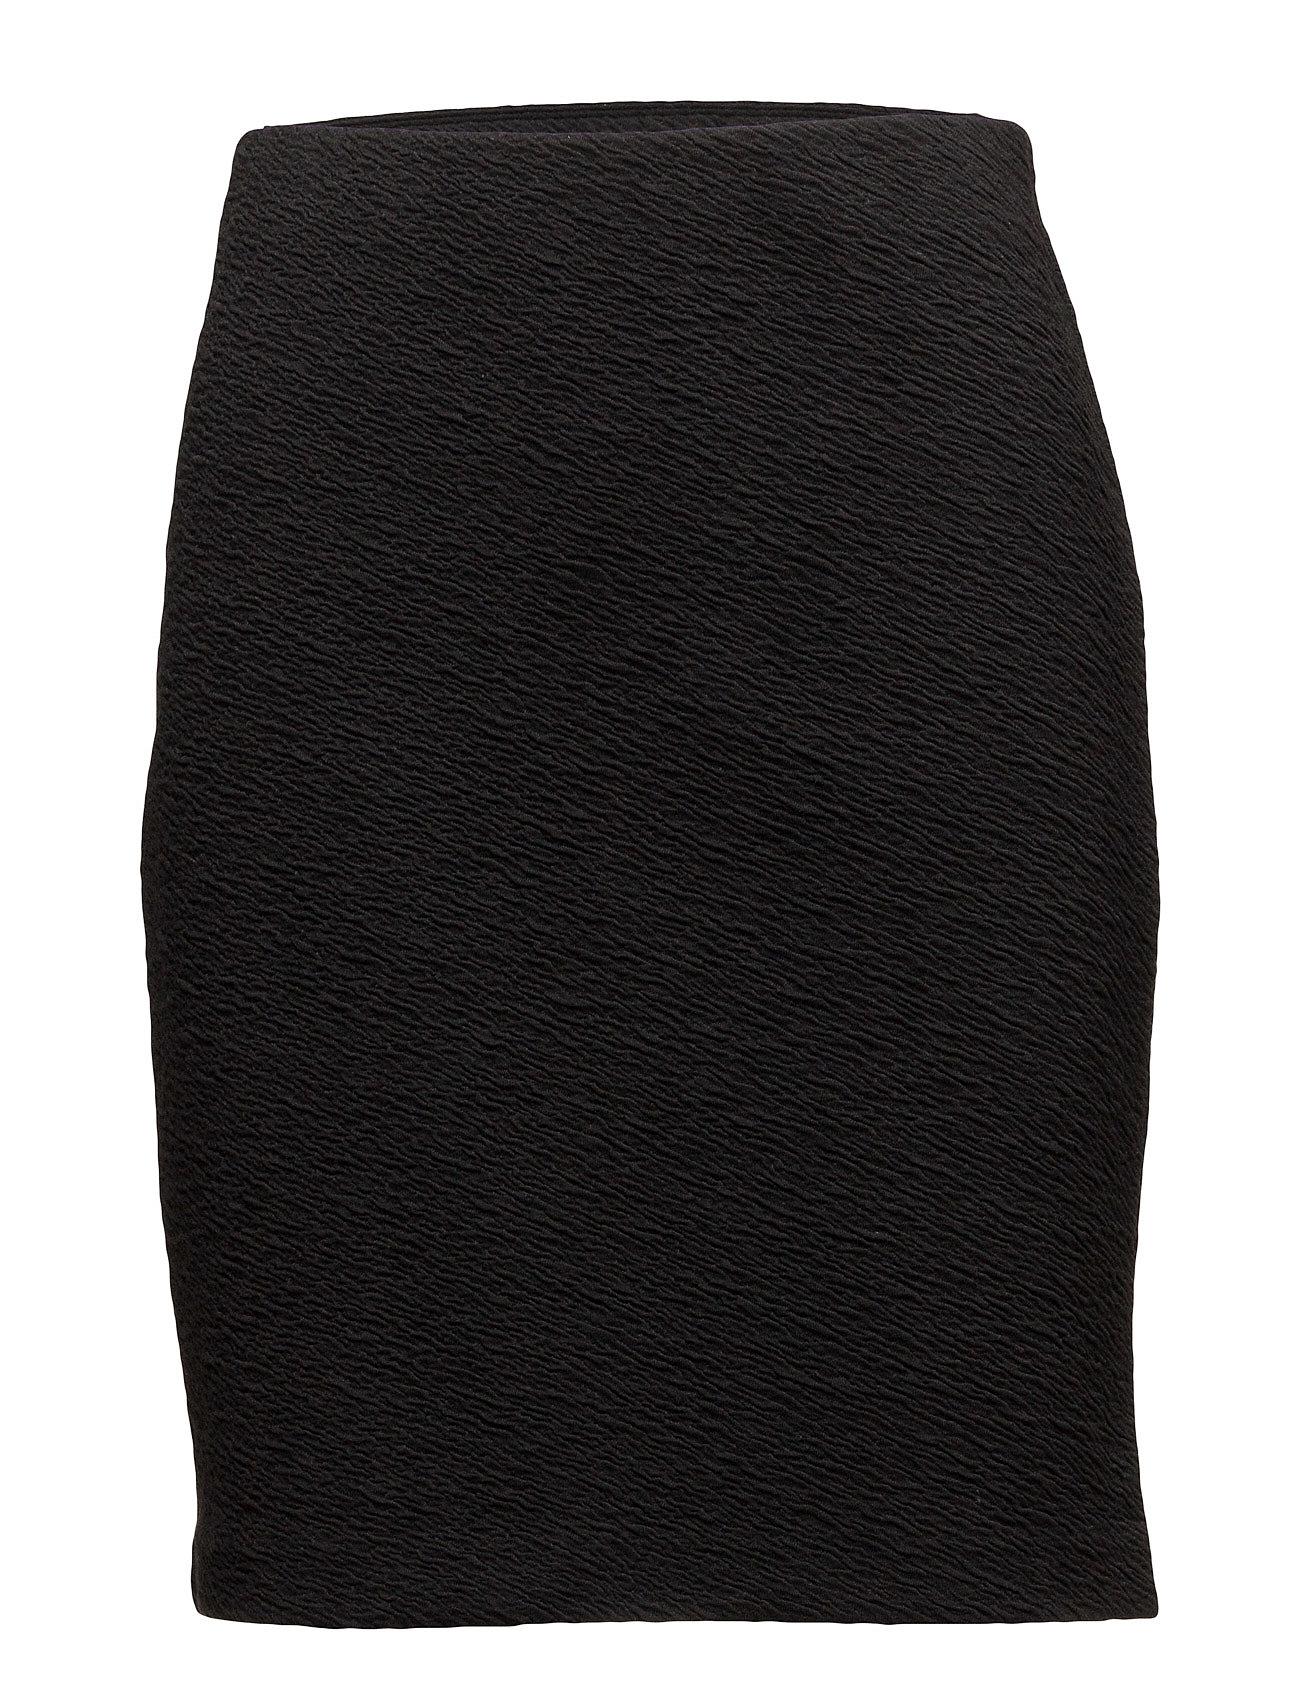 Skirt Short Jersey Betty Barclay Skirts thumbnail